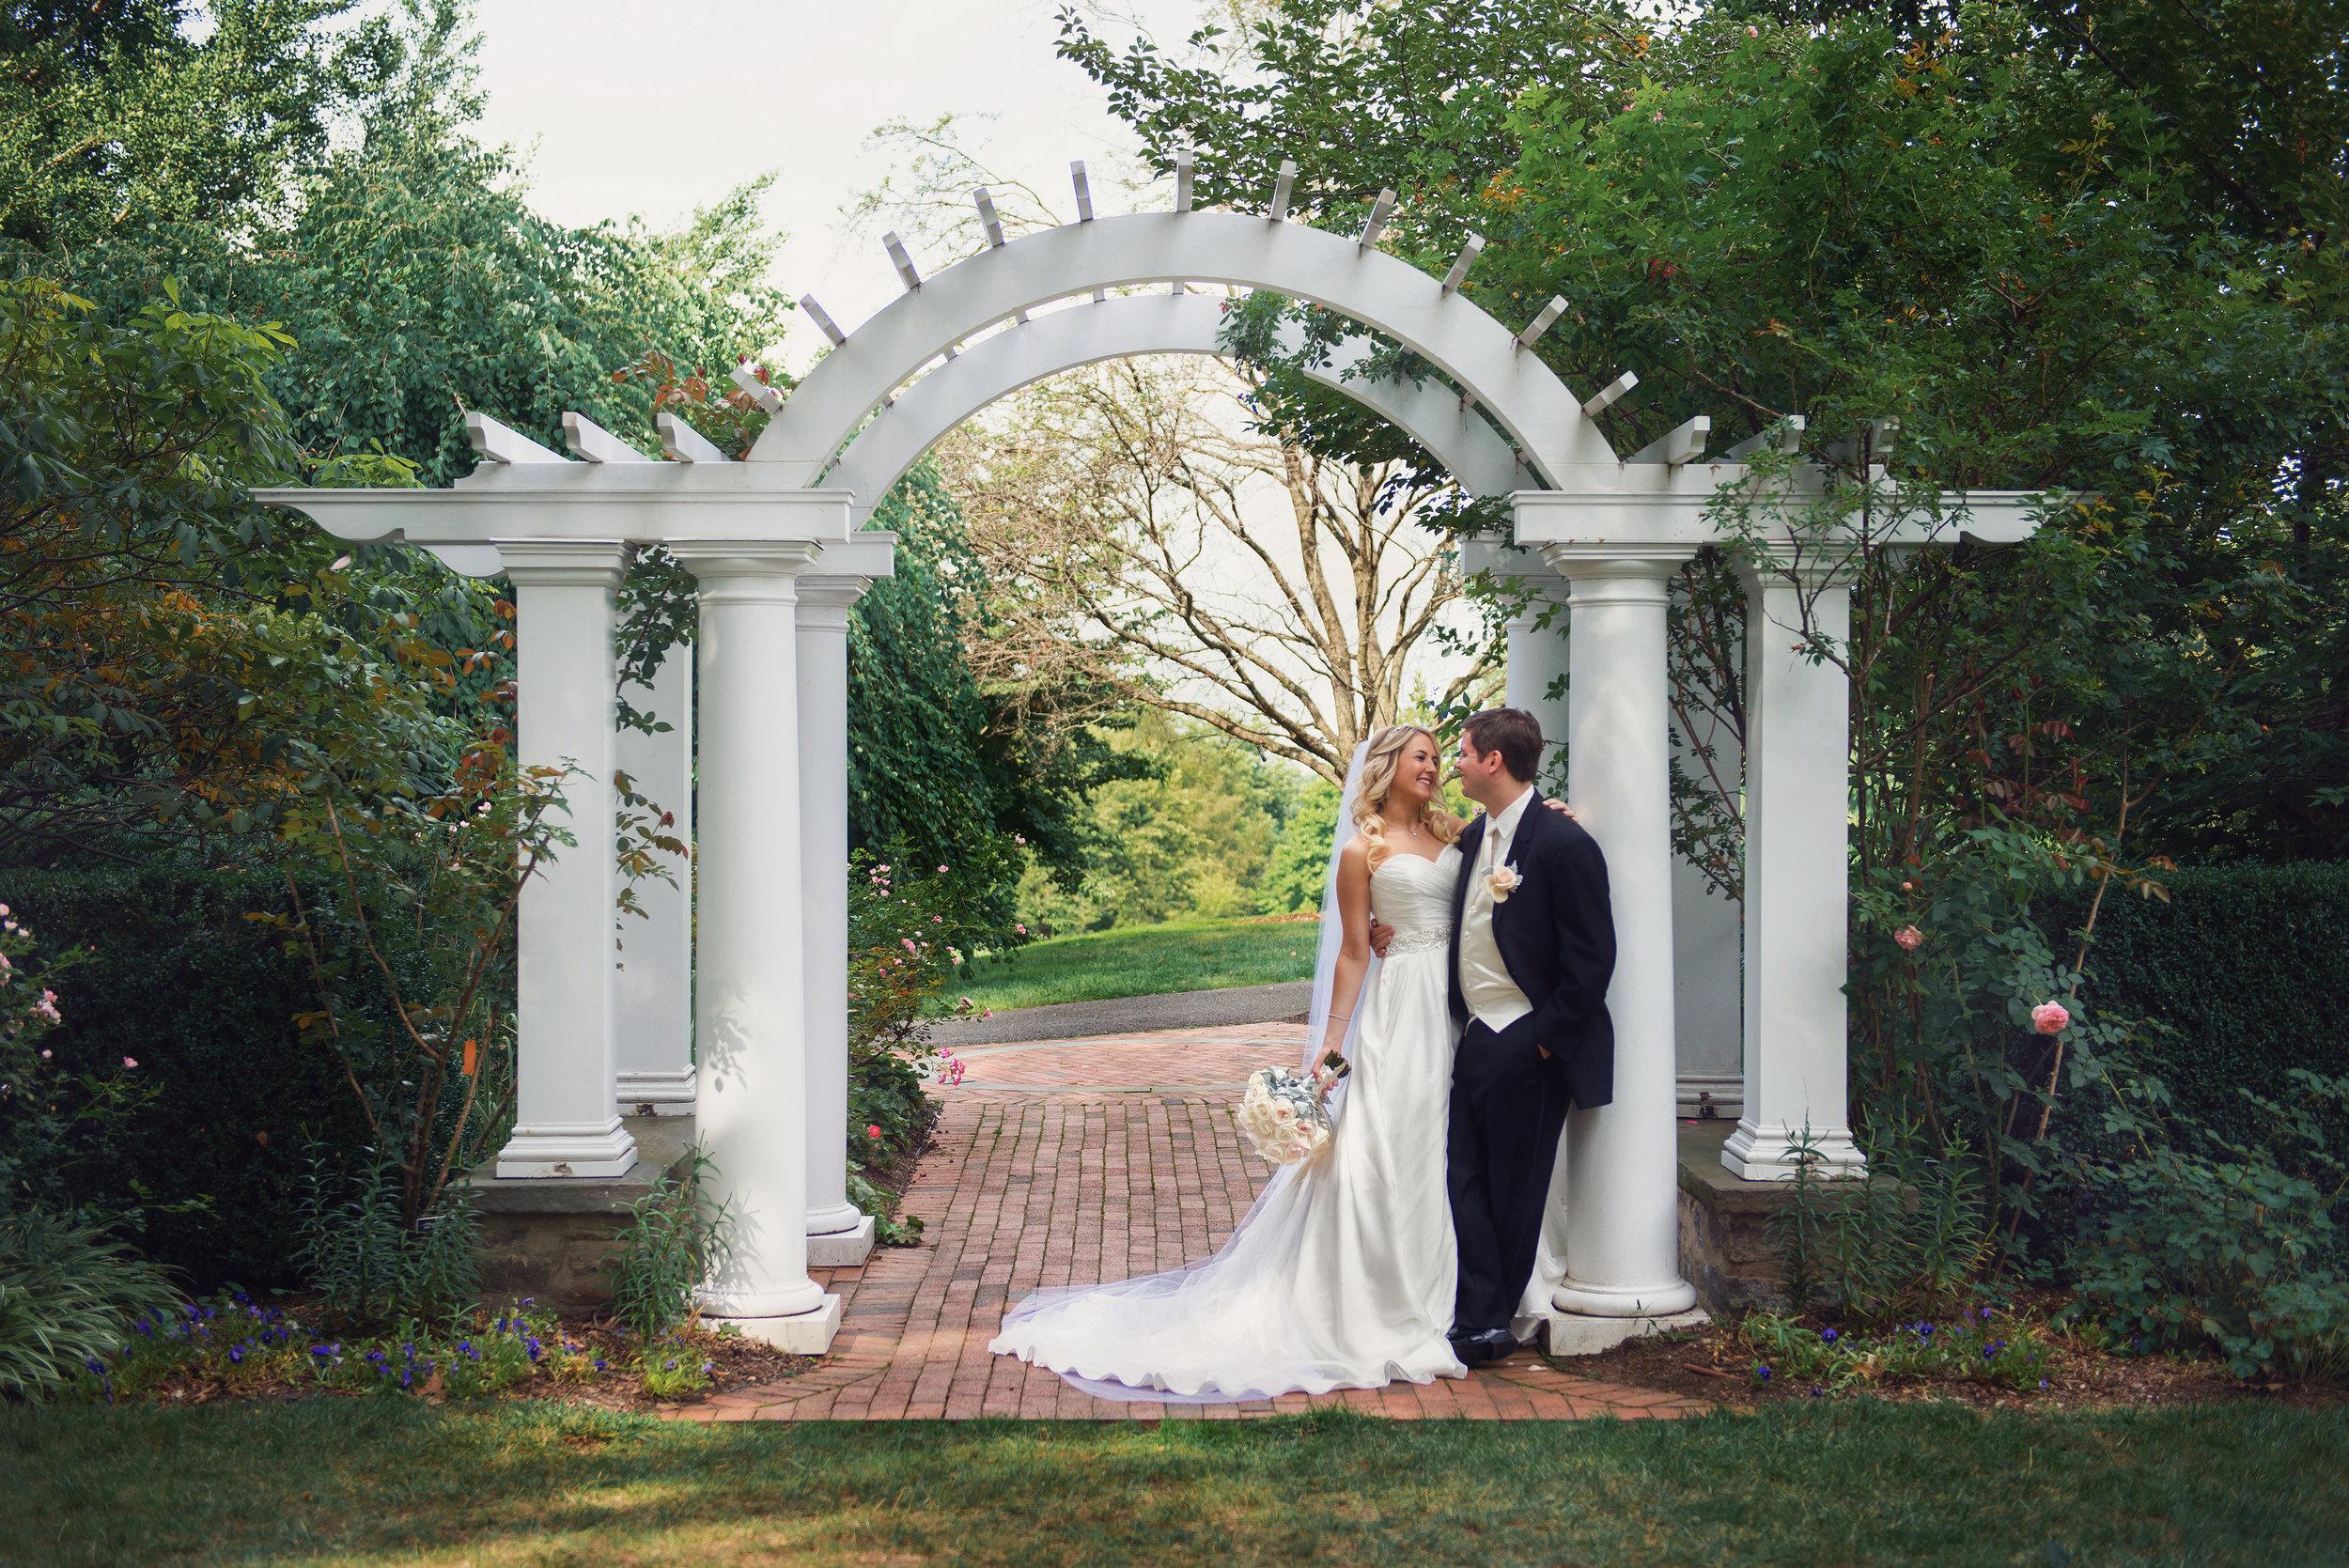 Wedding First Look Photos00950.jpg